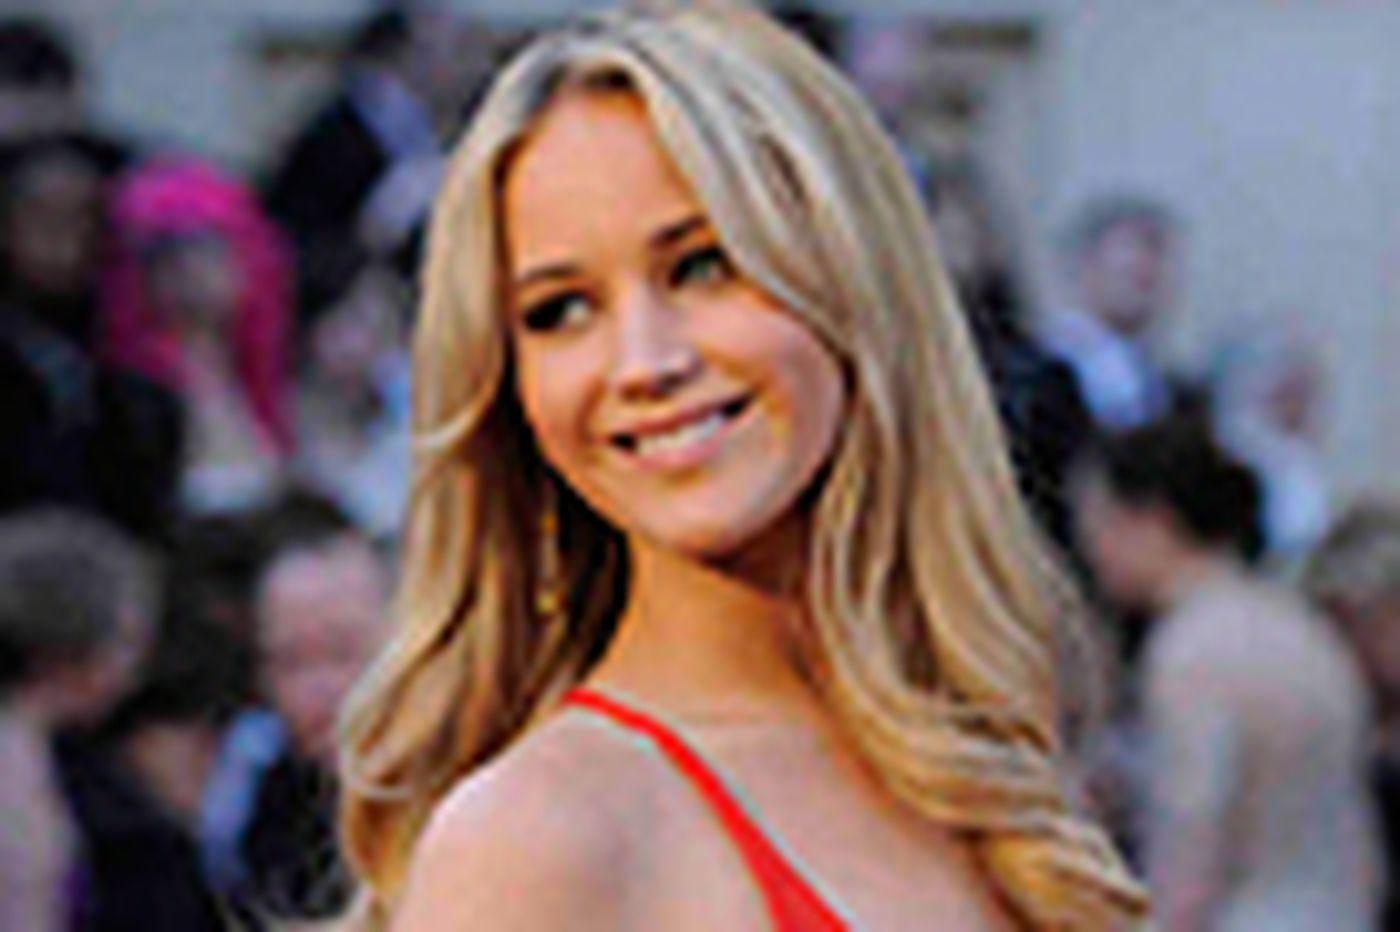 Tattle: Jennifer Lawrence joins 'Hunger Games'